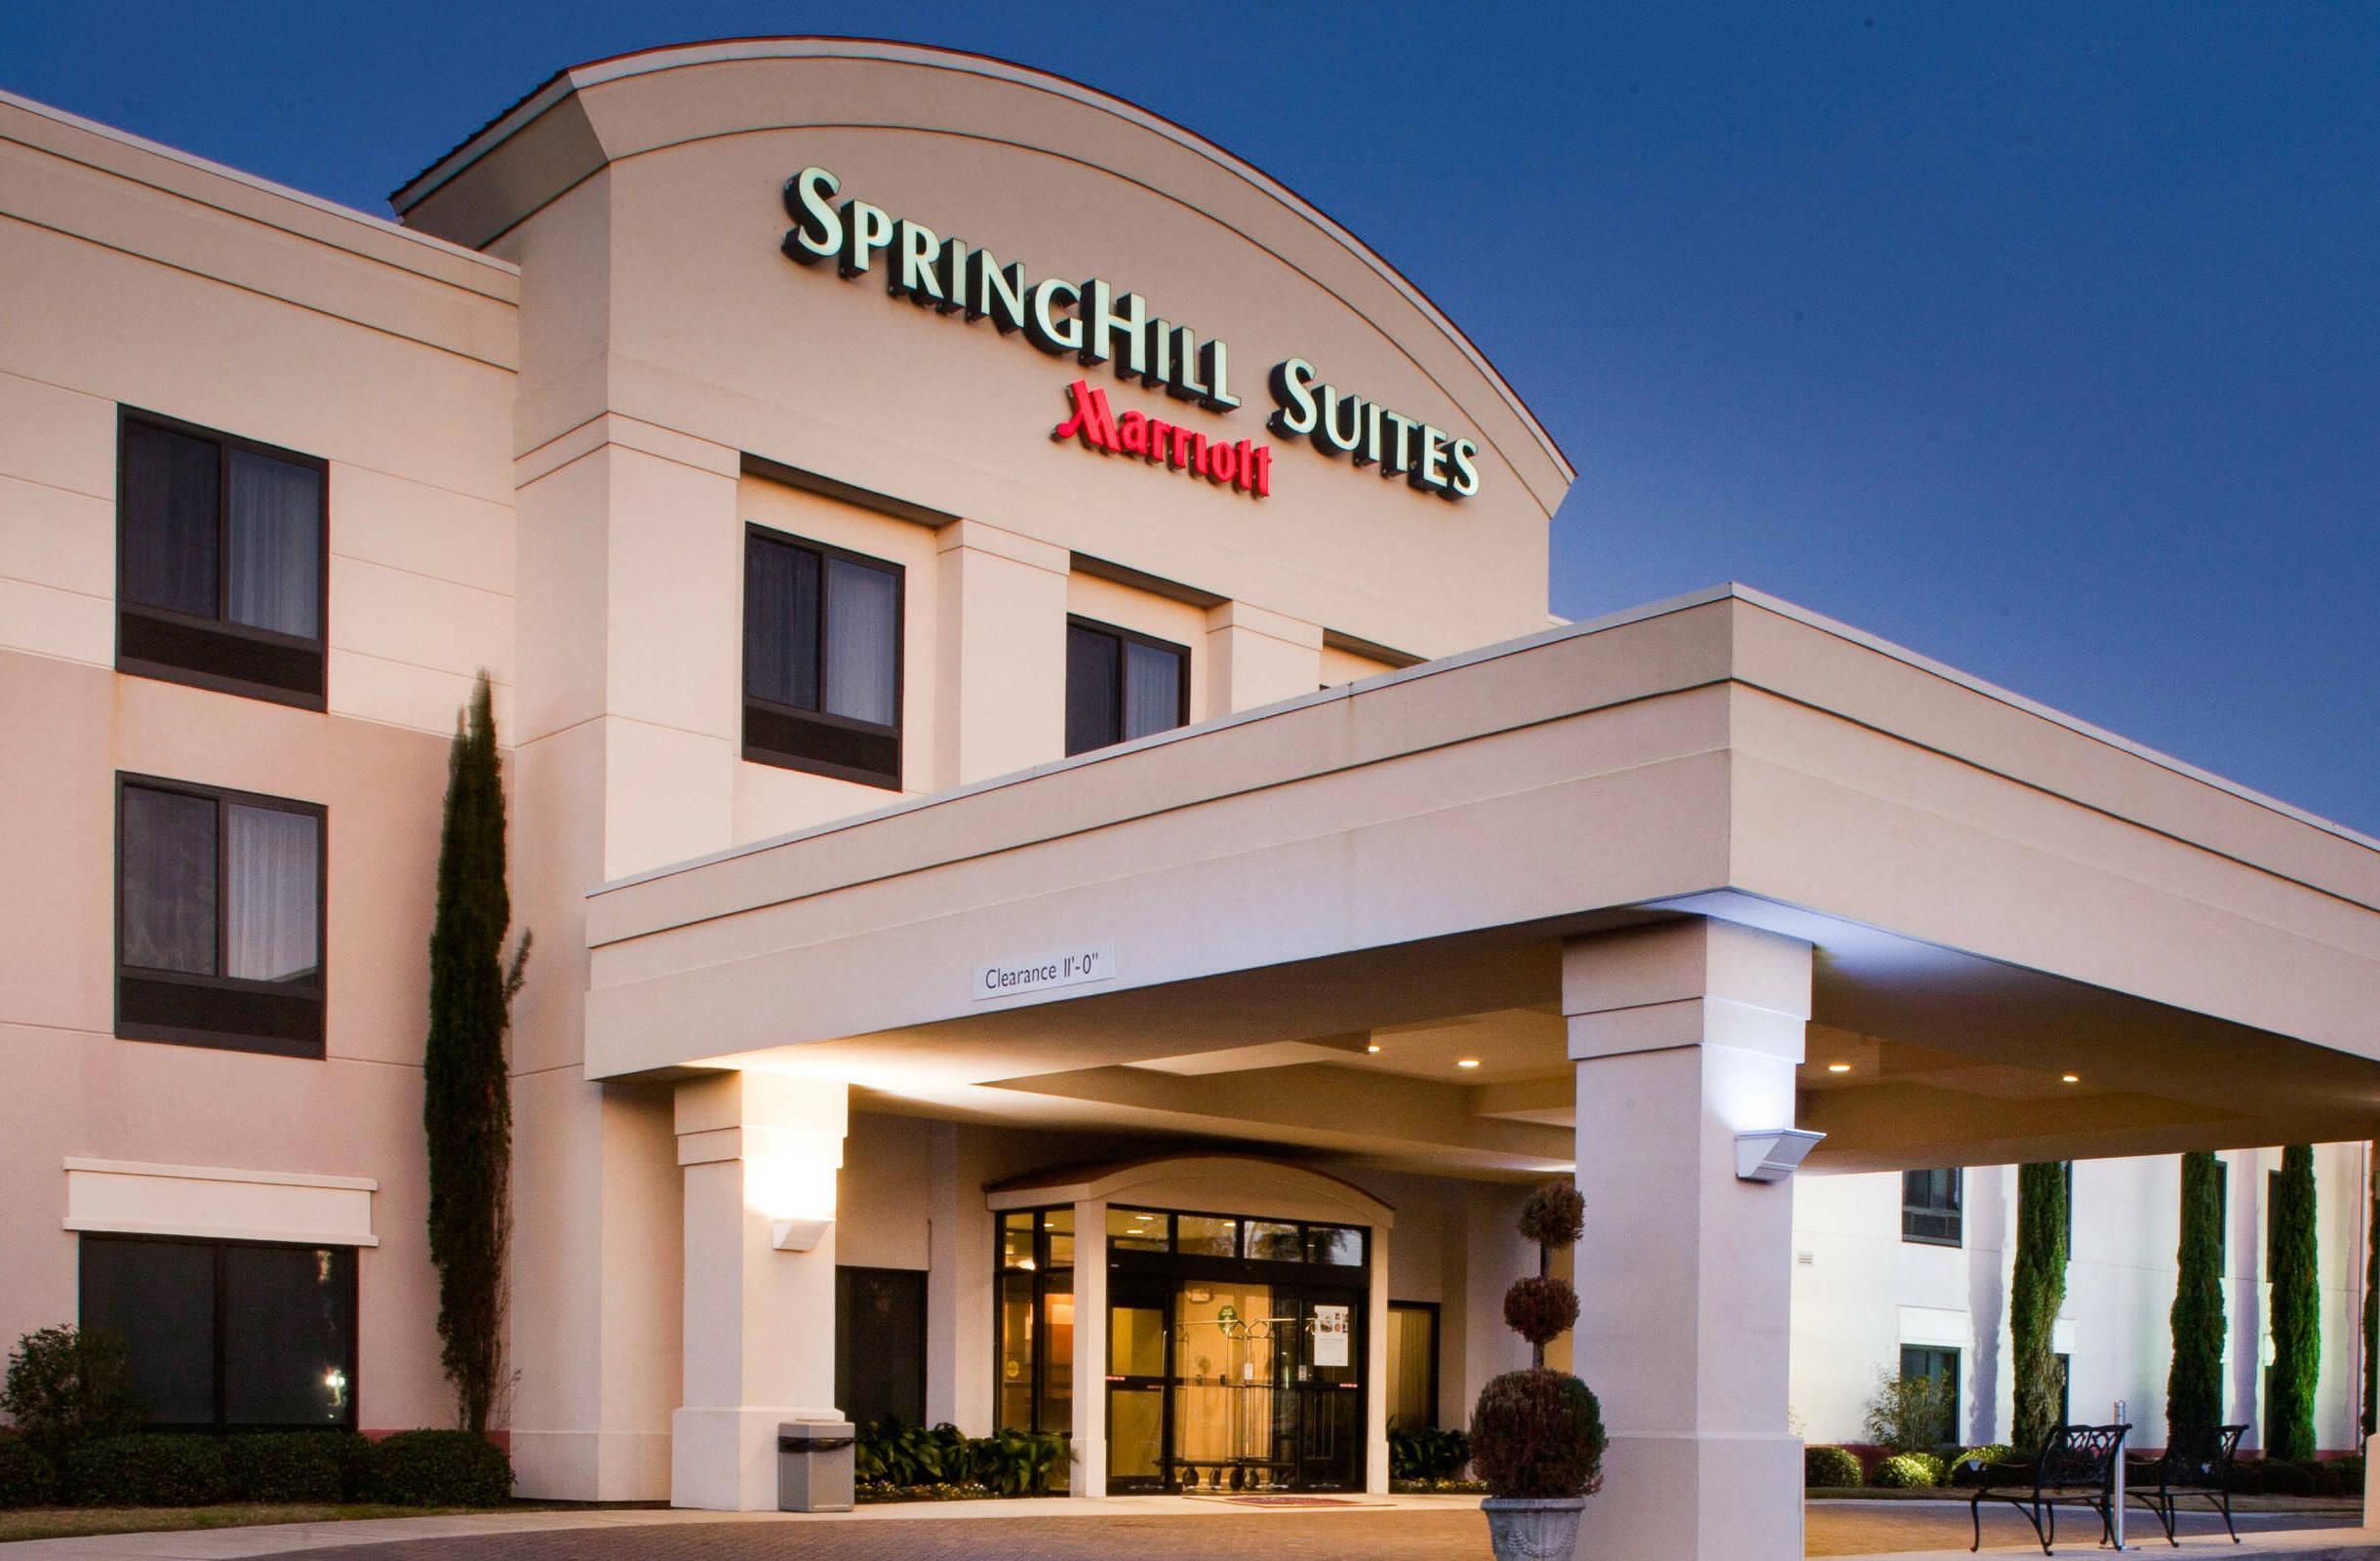 Springhill Suites Savannah, GA